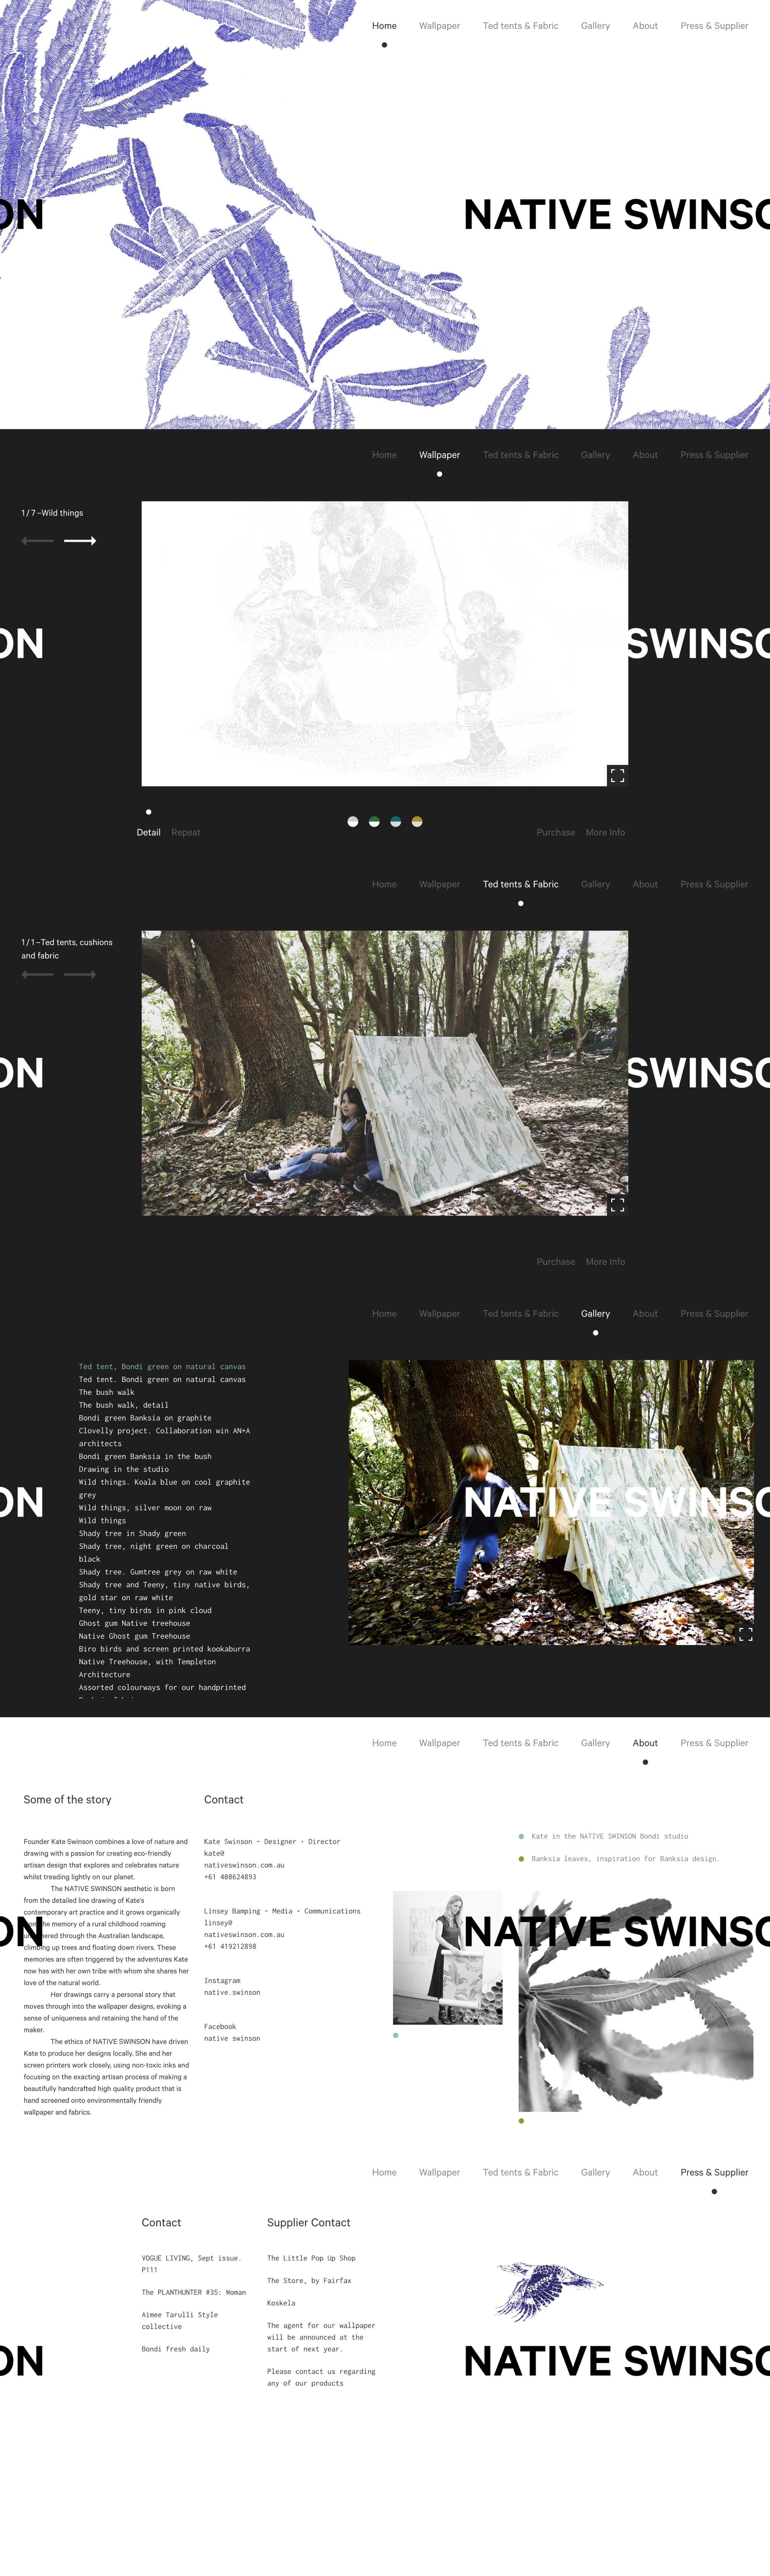 Native Swinson Website Screenshot